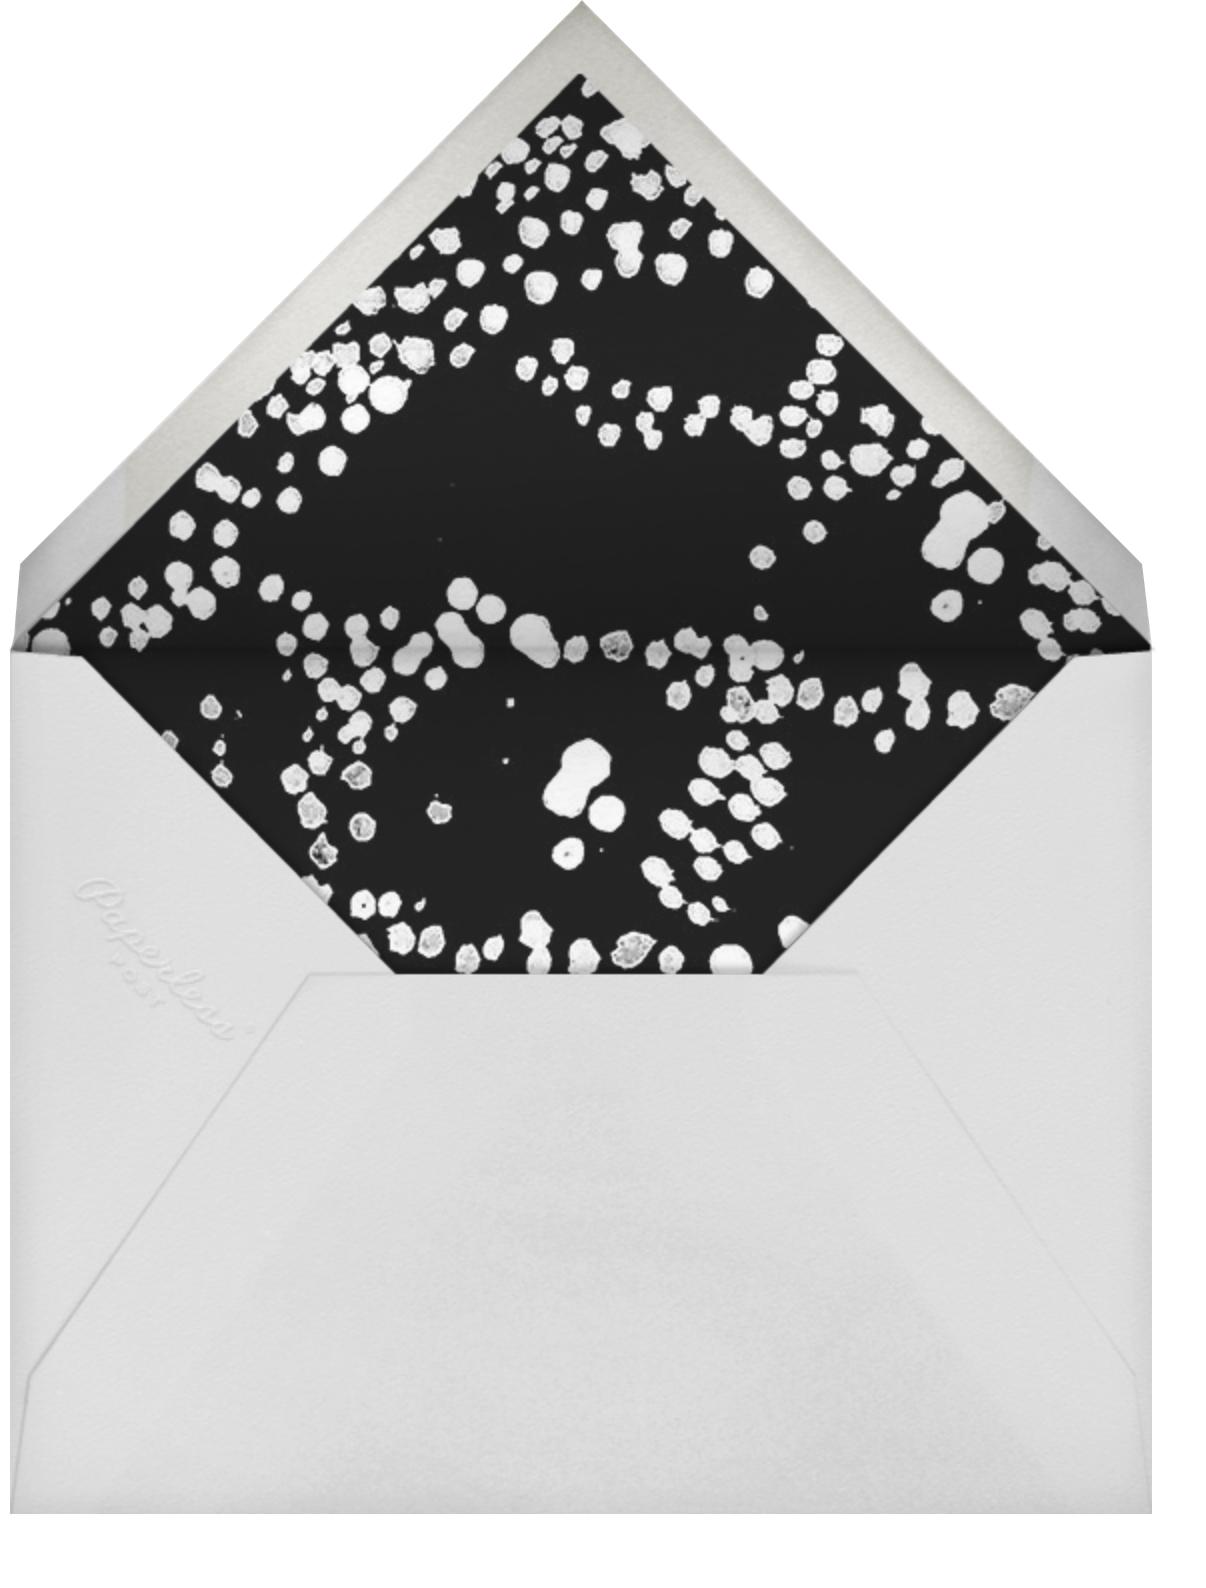 Axis - Kelly Wearstler - New Year's Eve - envelope back